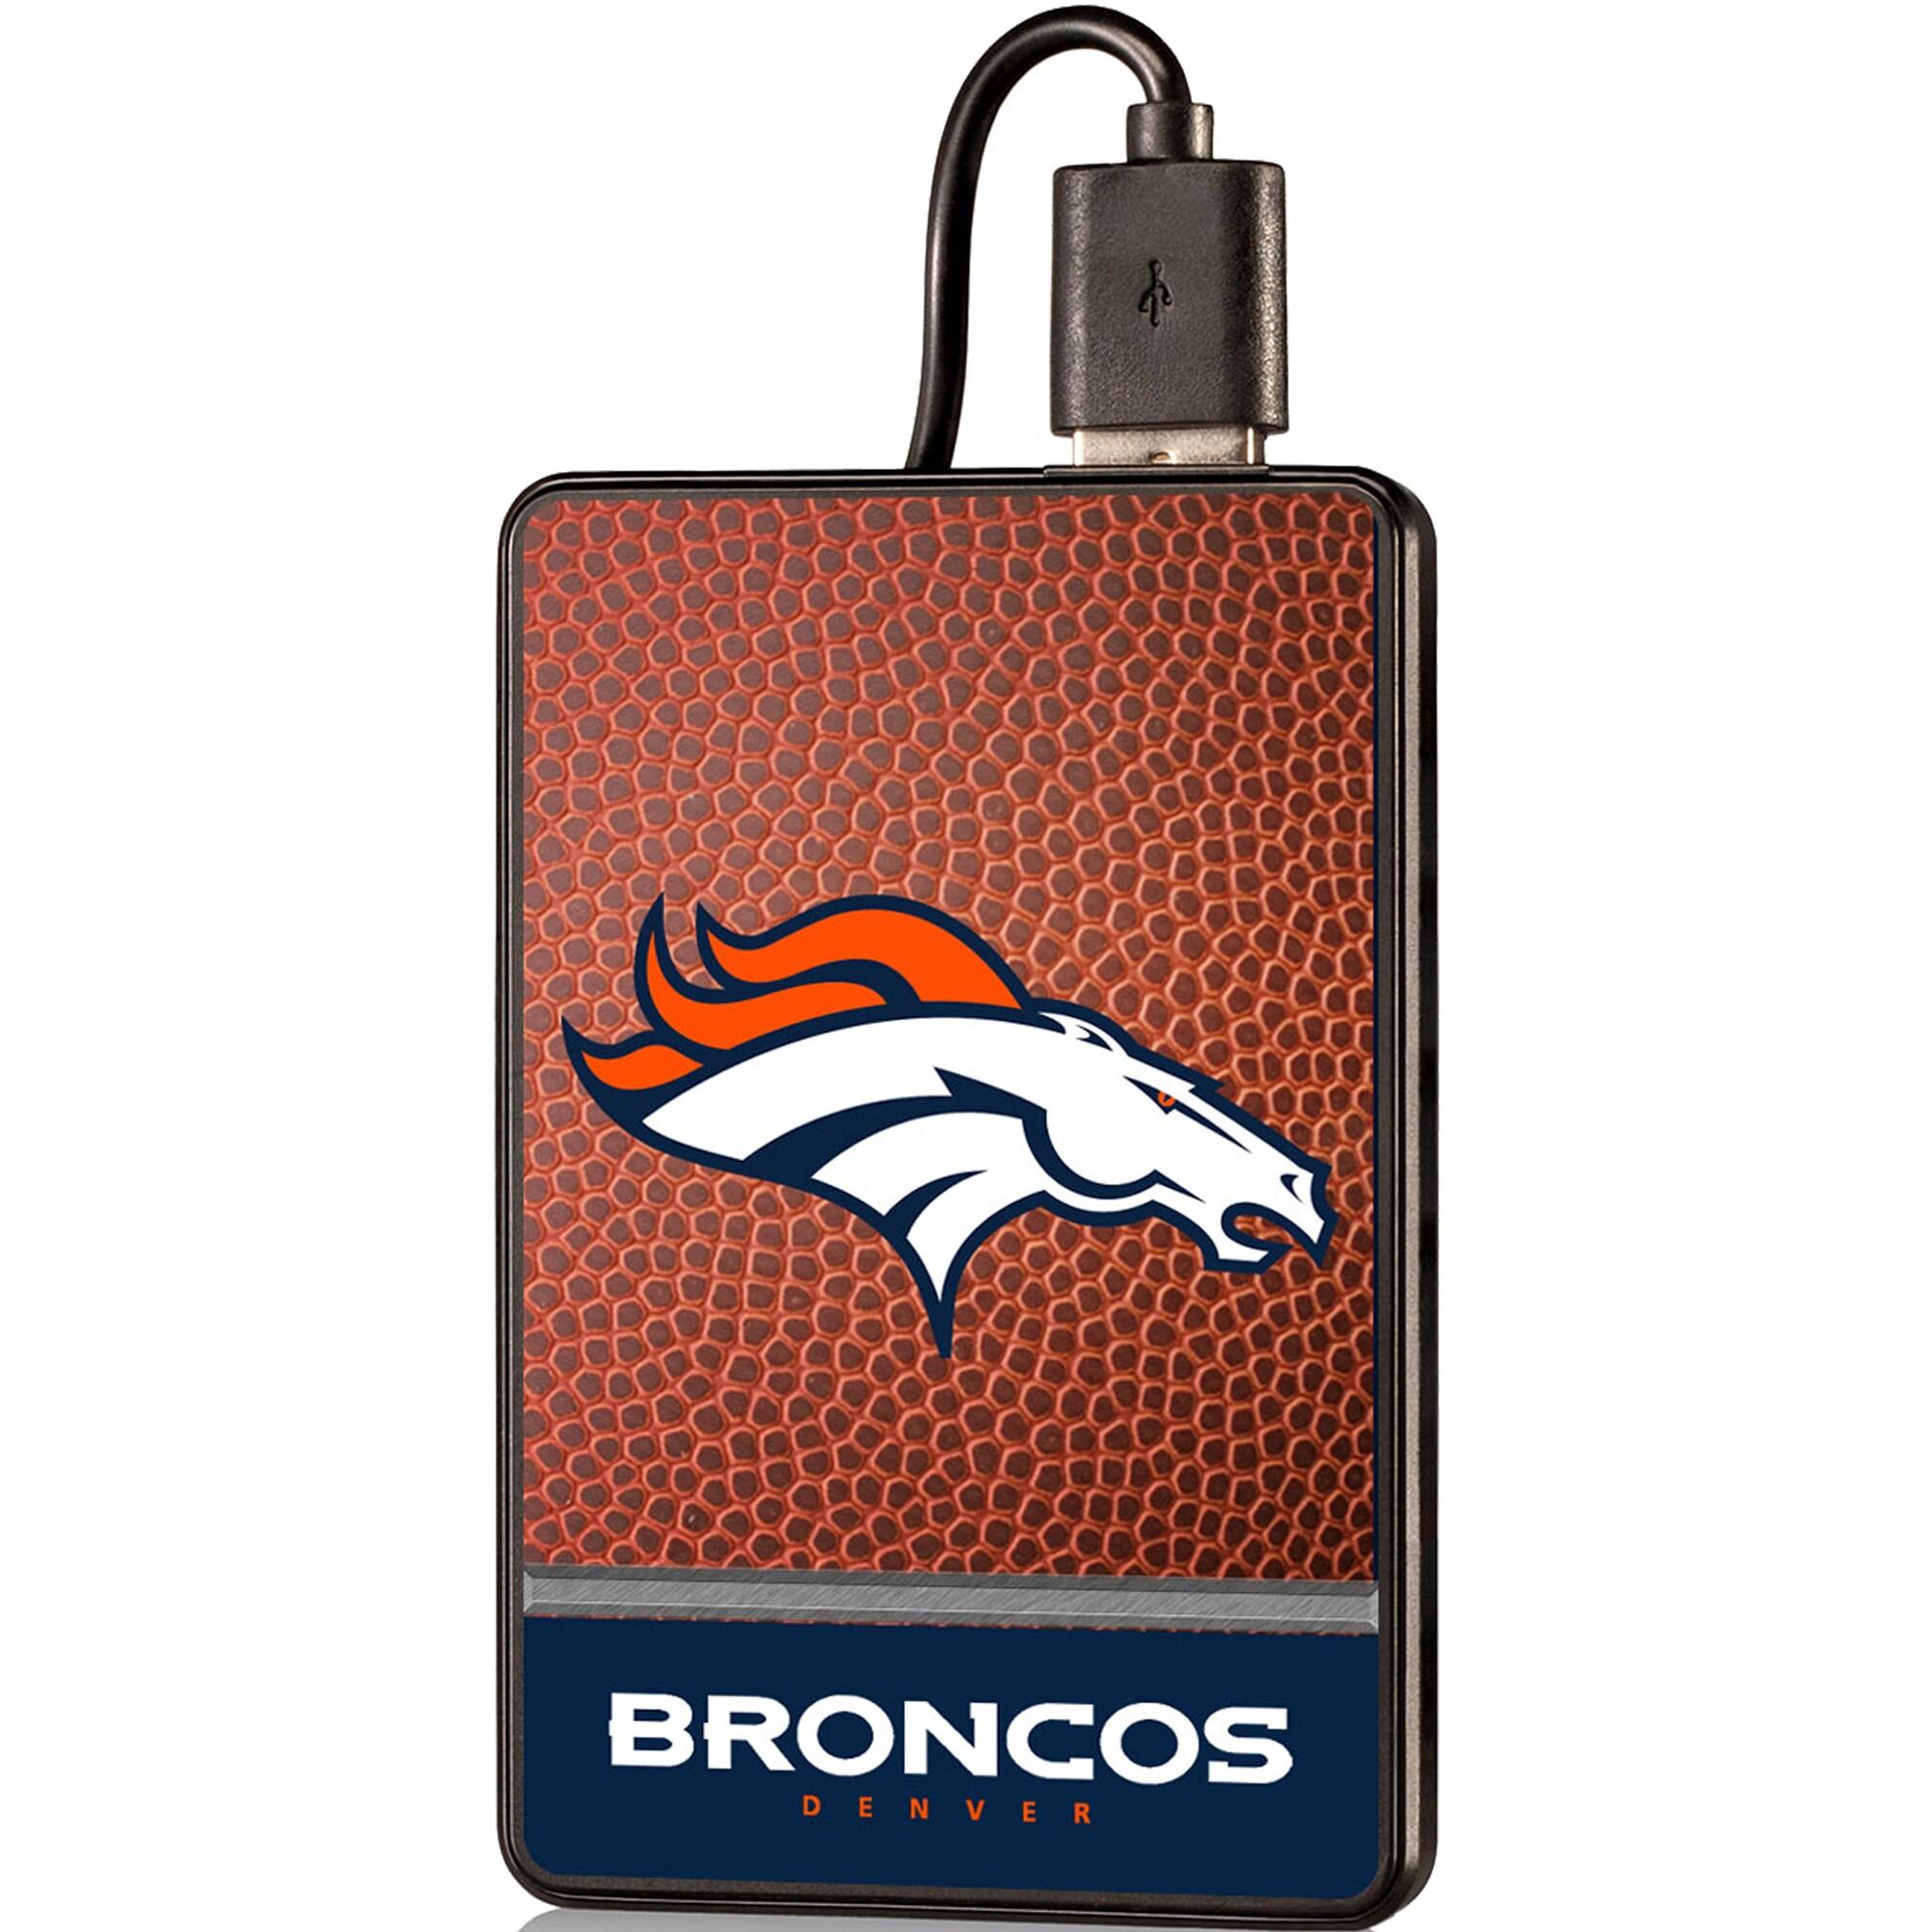 Denver Broncos 2000 mAh Credit Card Powerbank